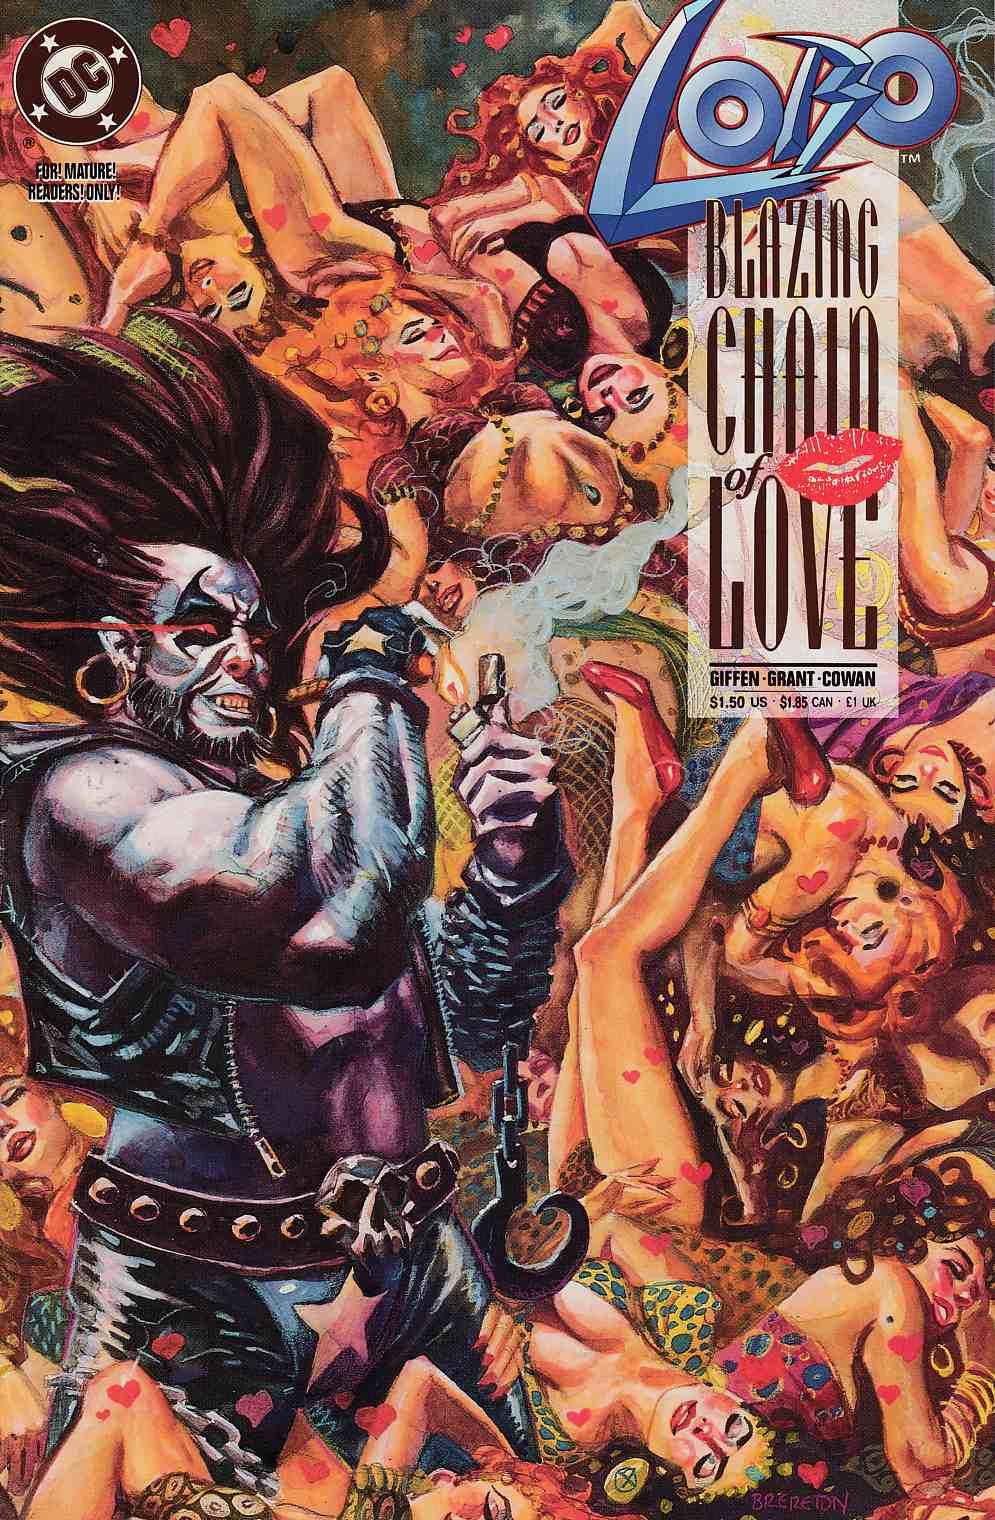 Lobo Blazing Chain of Love Giffen Grant Cowan #1 DC Comics September 1992 NM